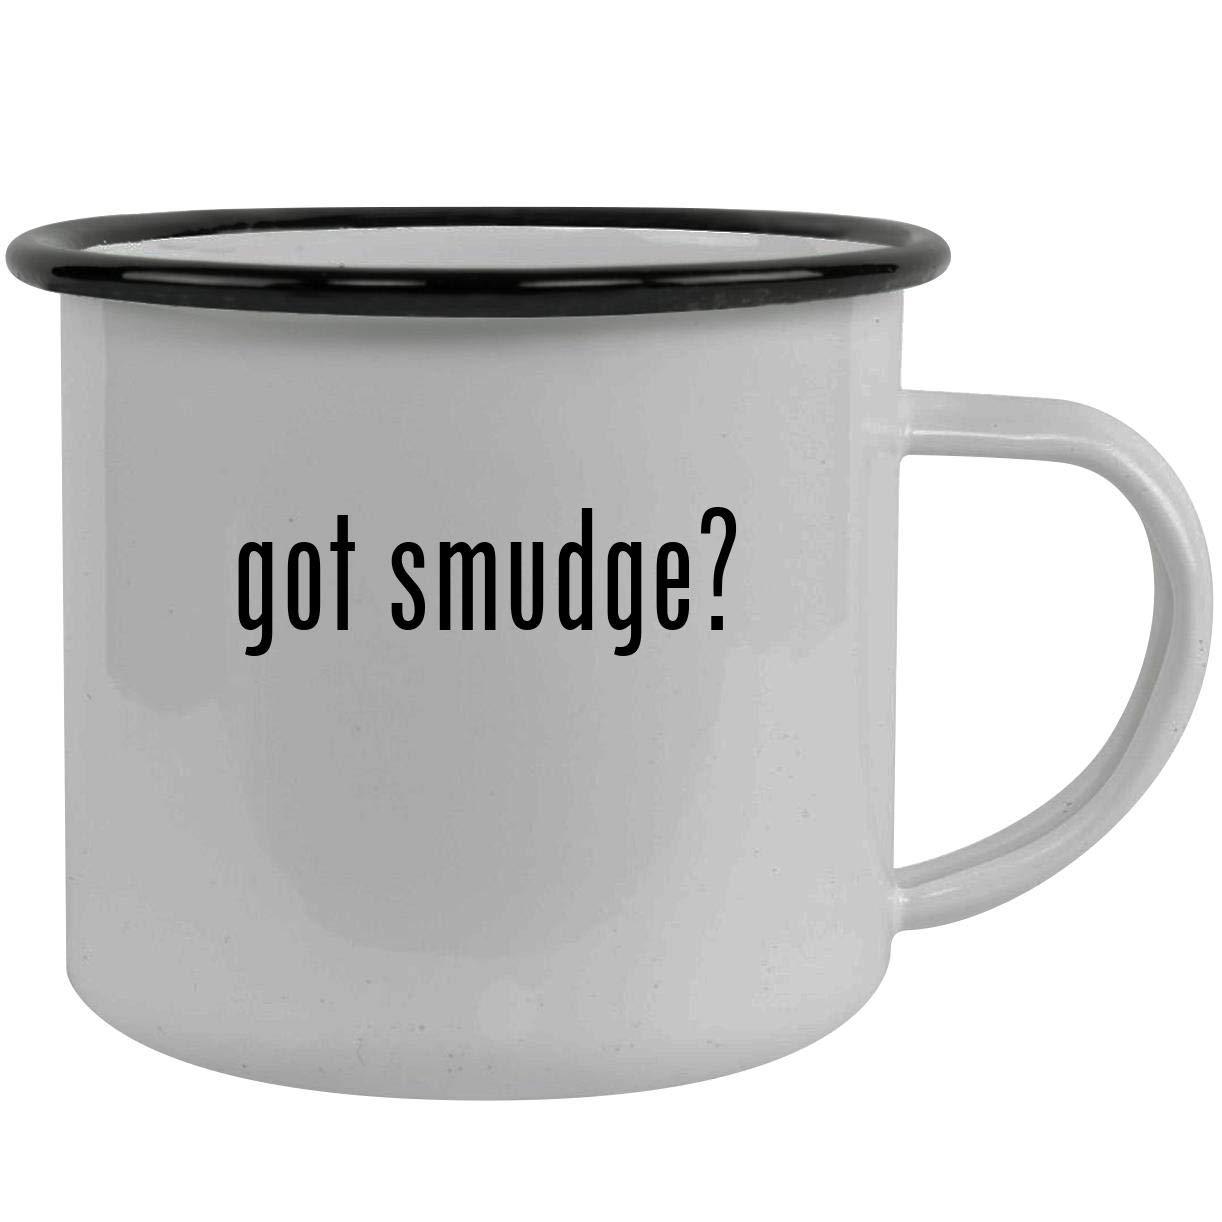 got smudge? - Stainless Steel 12oz Camping Mug, Black